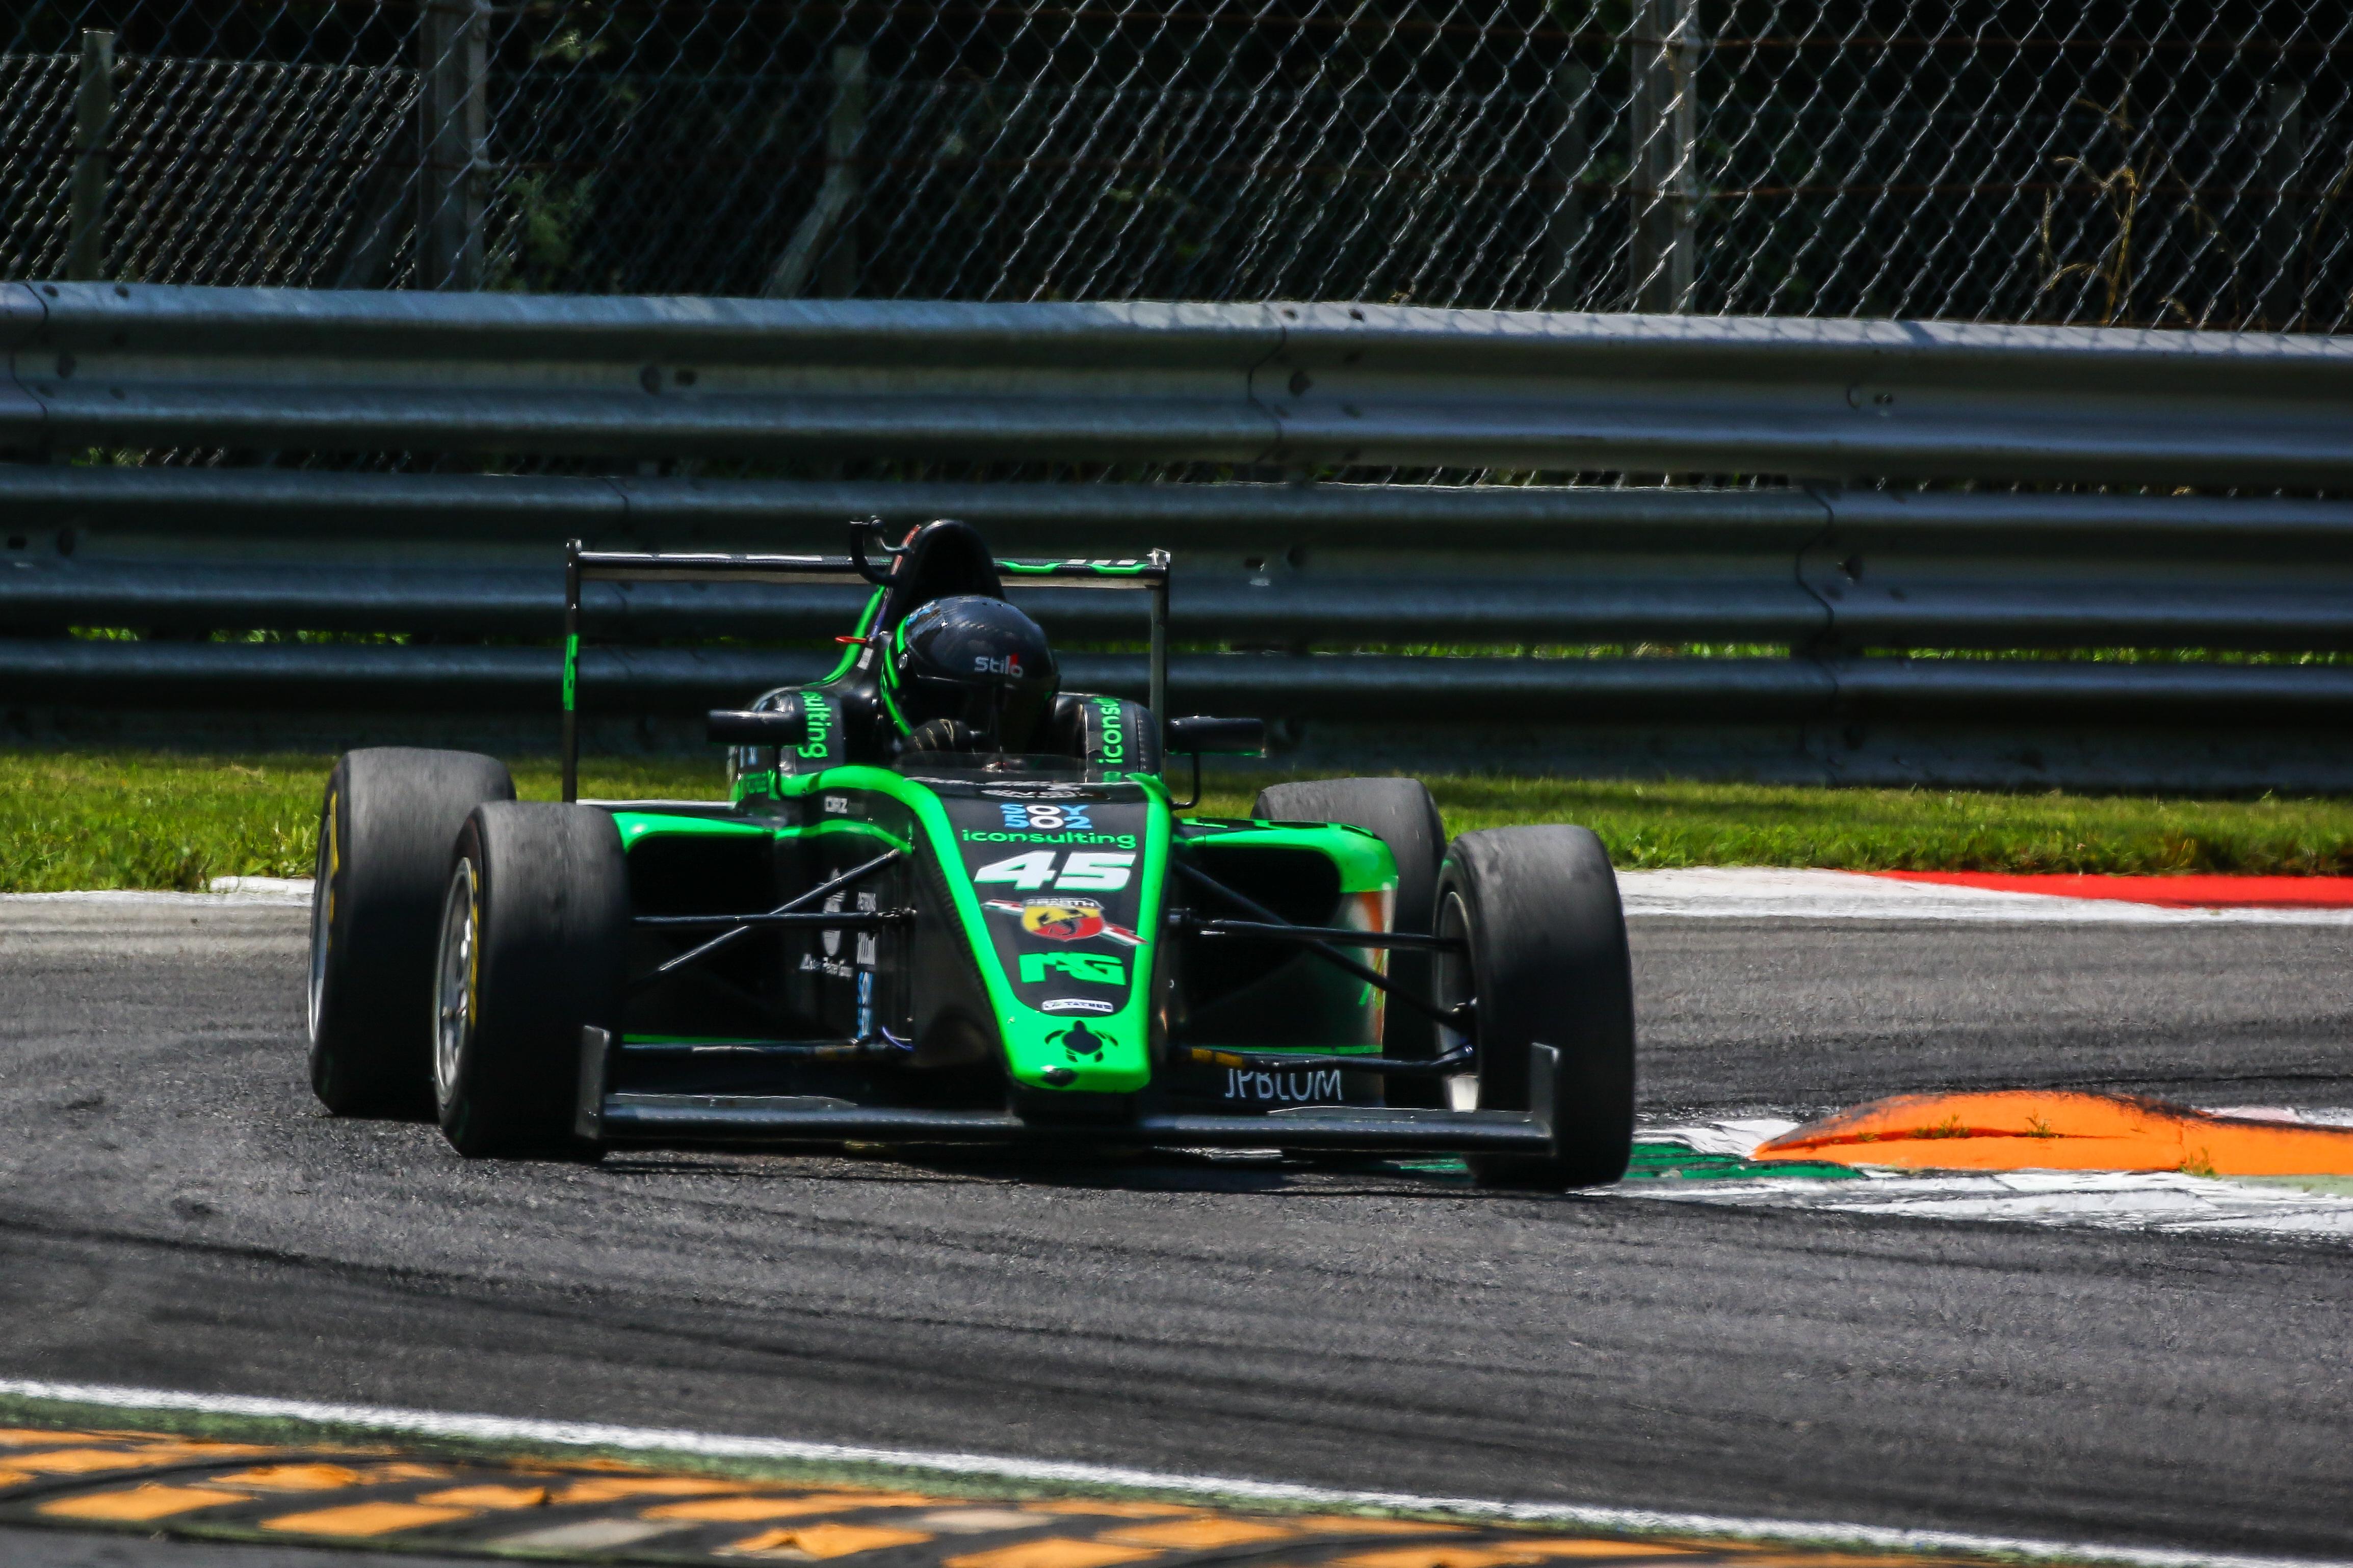 Ian Rodriguez, DRZ, Monza 2018-3043